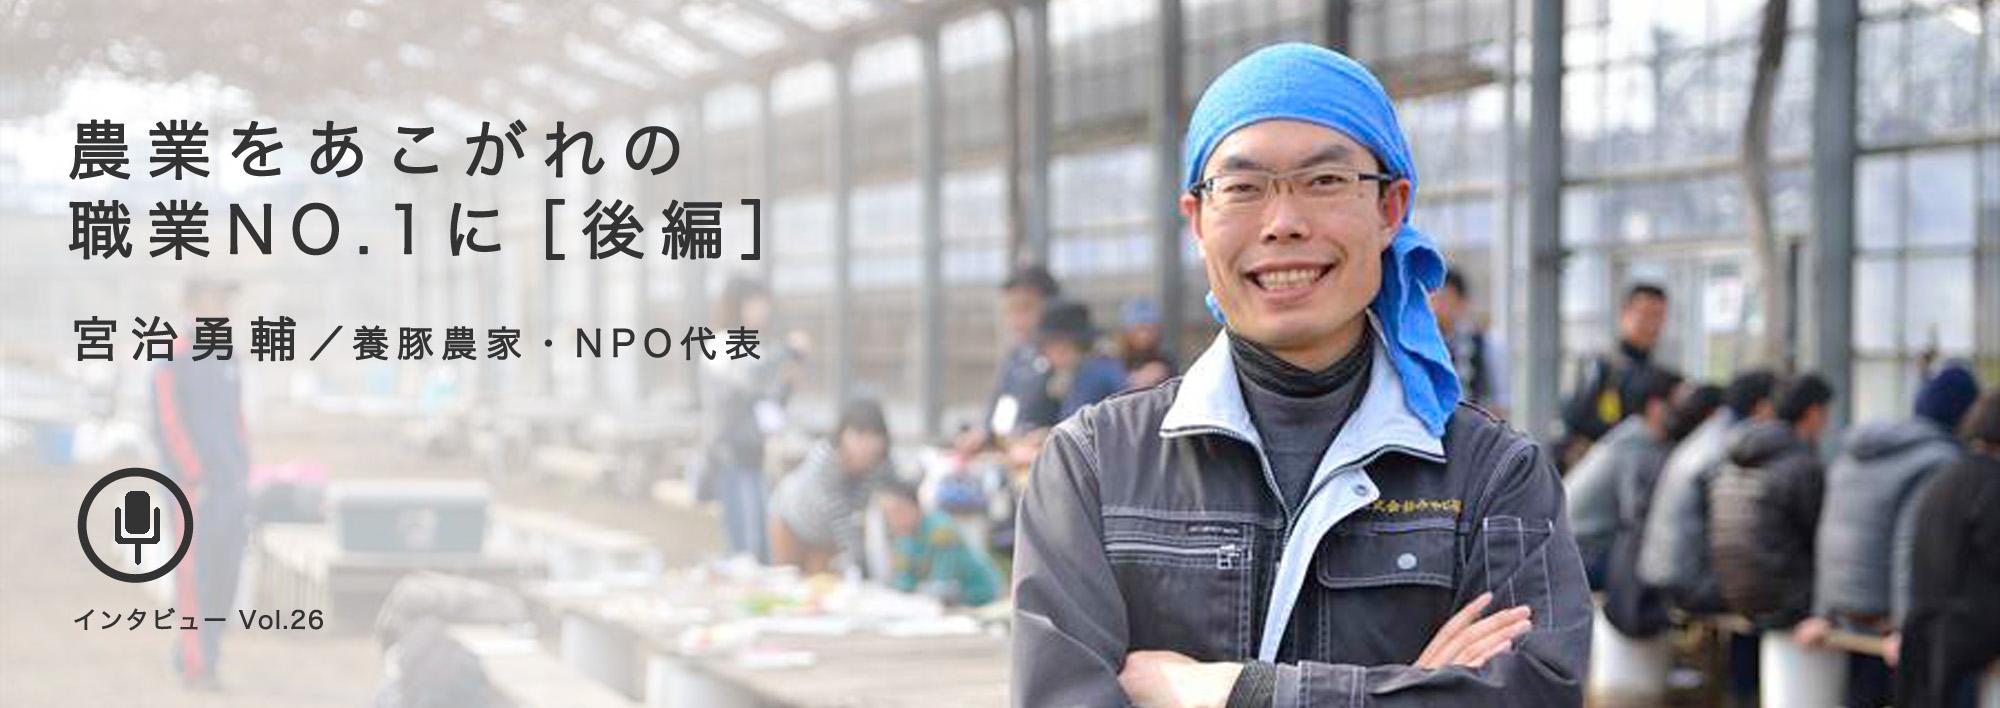 http://interviewer69.com/top_covermiyaji.jpg